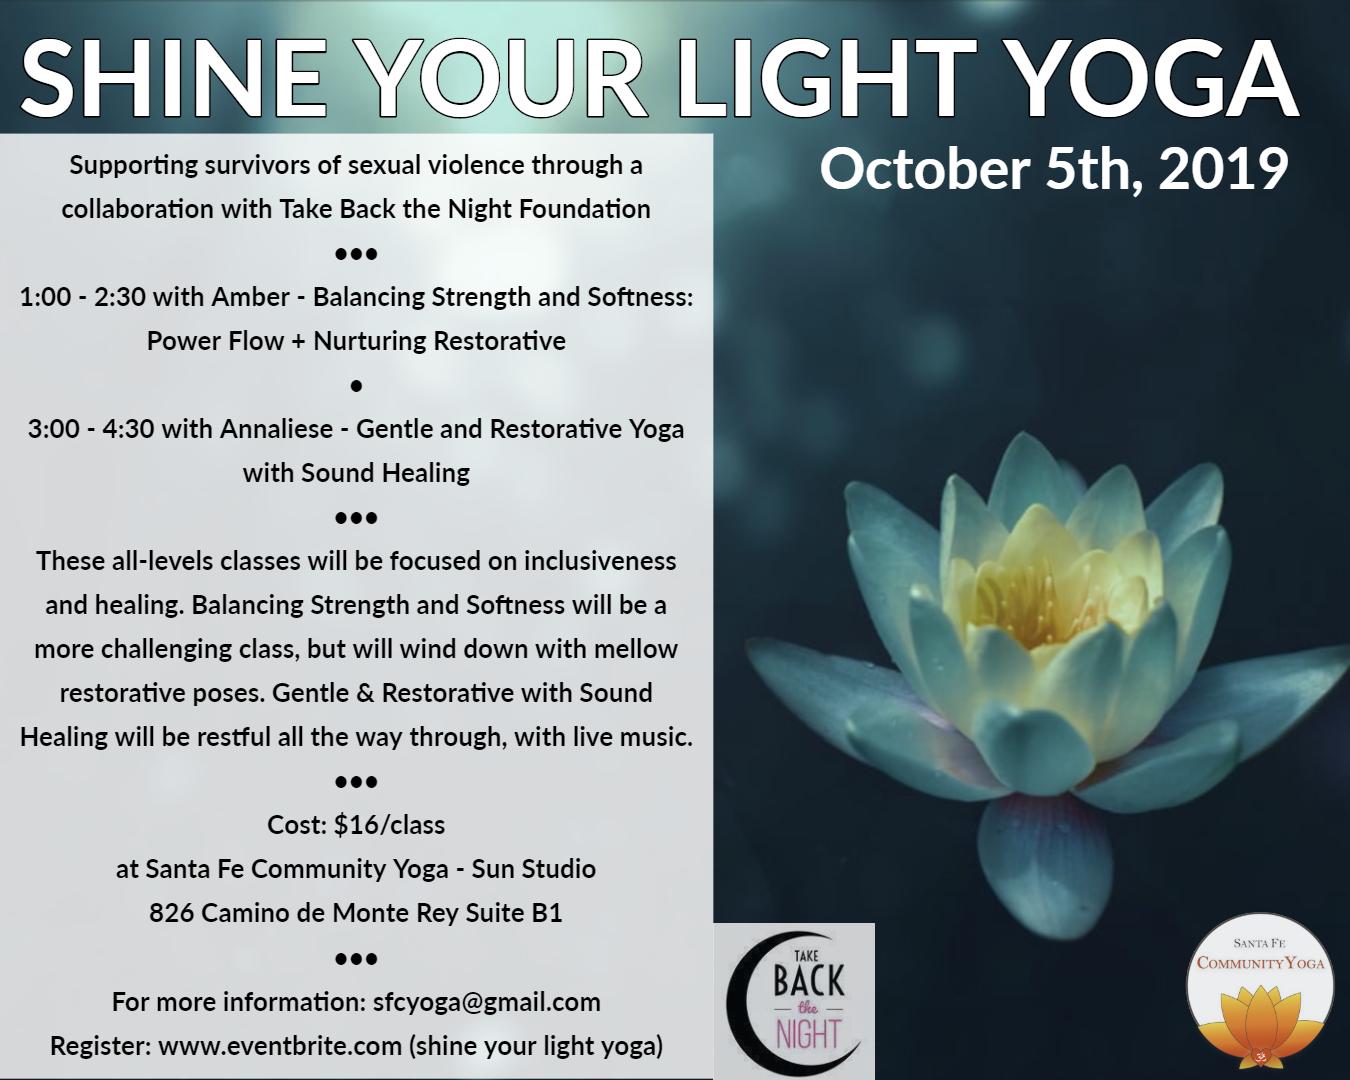 Shine Your Light Yoga Events.jpg